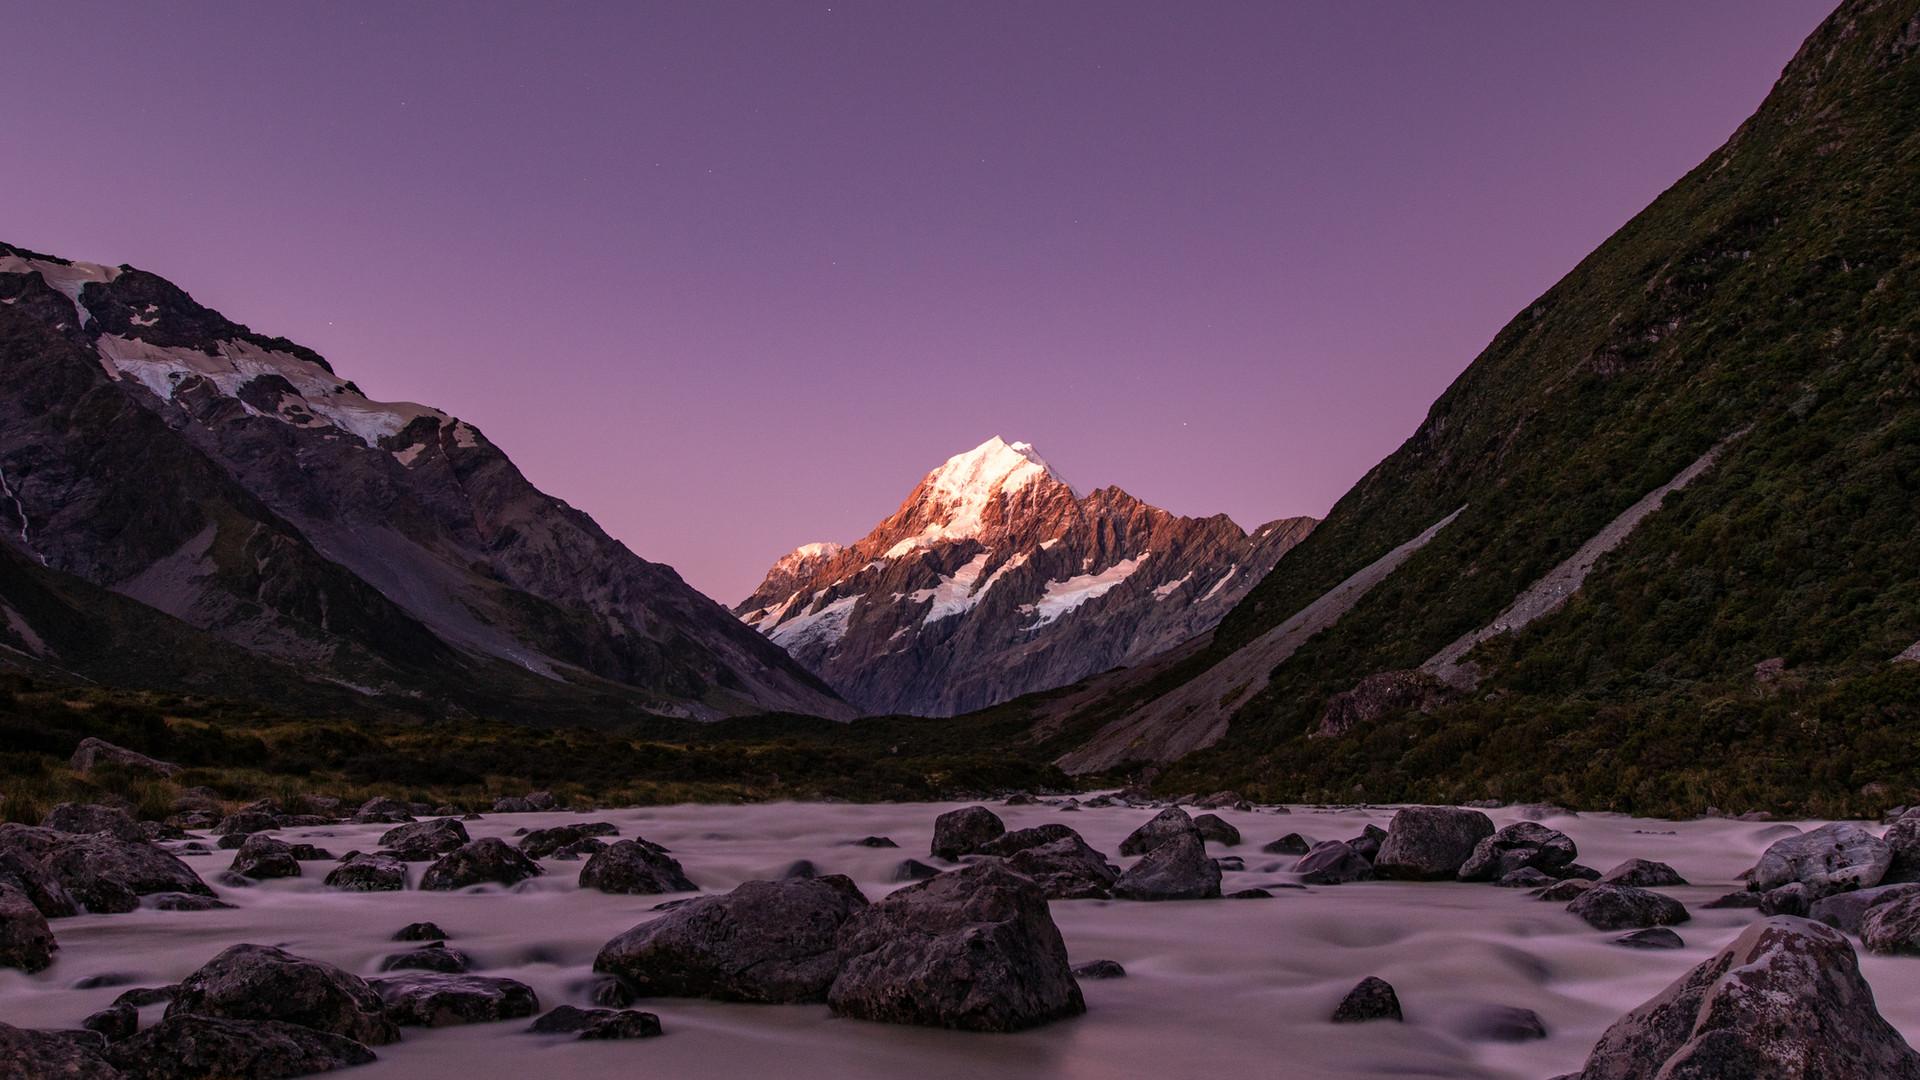 Mt. Cook Purple